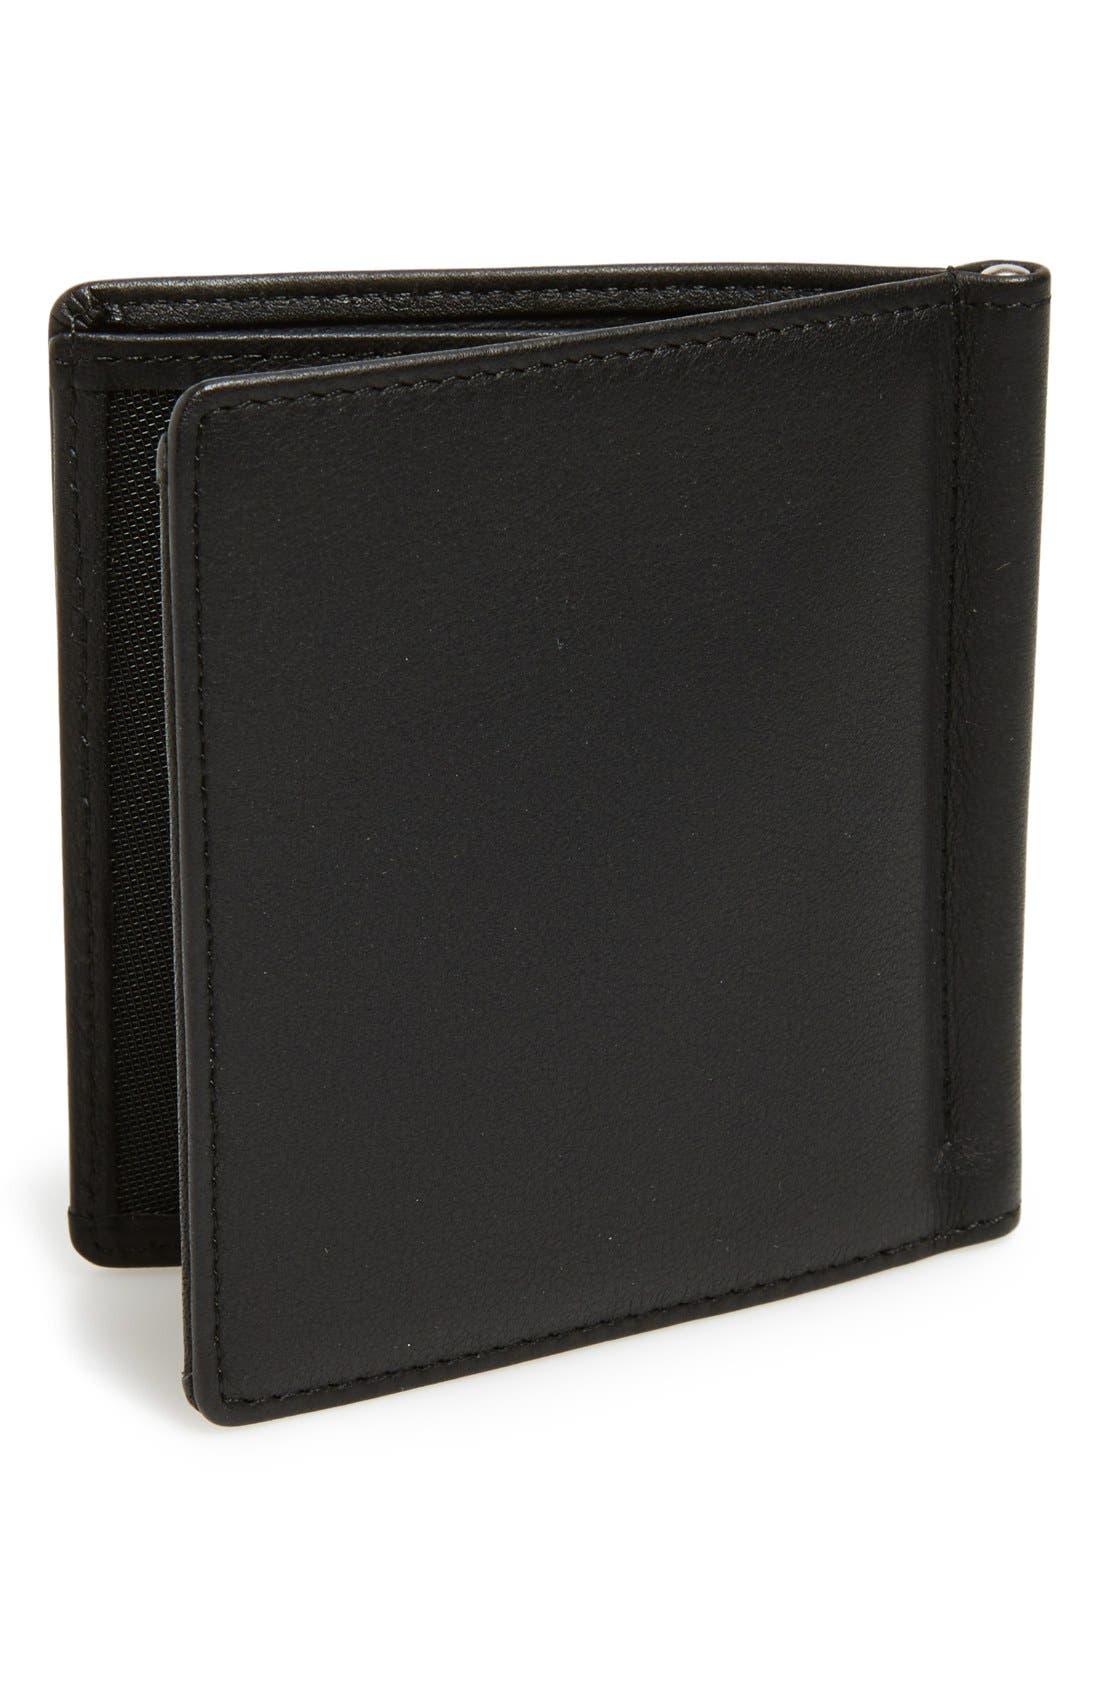 'CL2 2.0' Money Clip Card Holder,                             Alternate thumbnail 2, color,                             Black